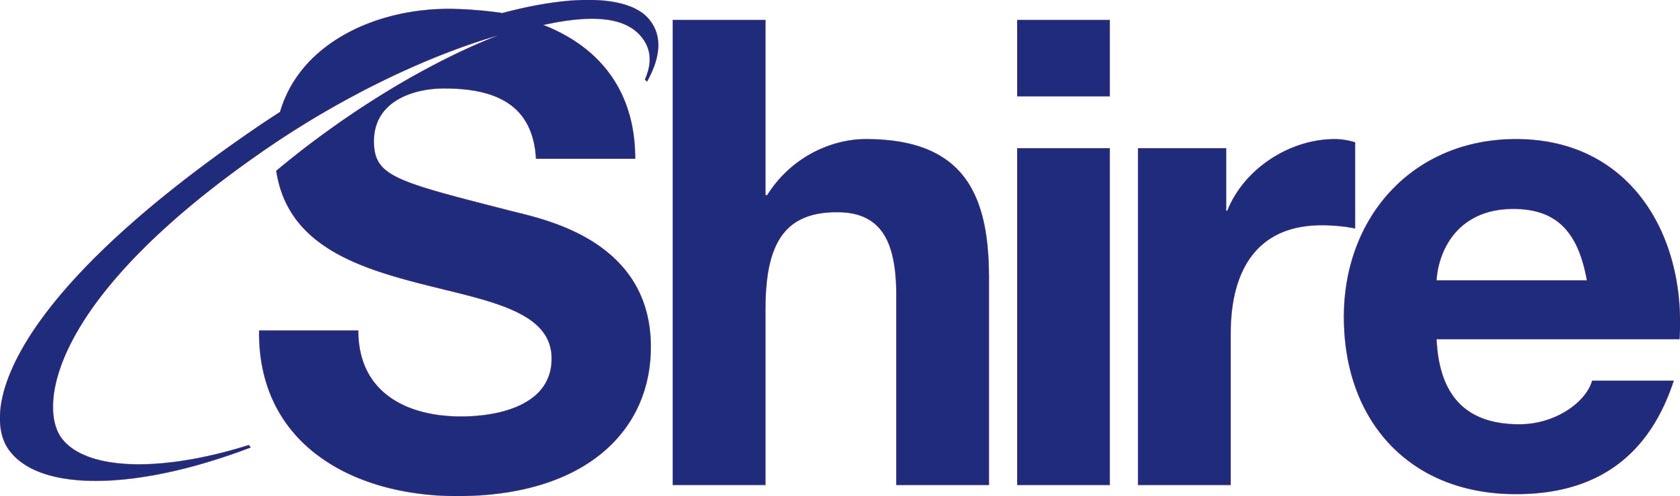 shire-logo.jpg